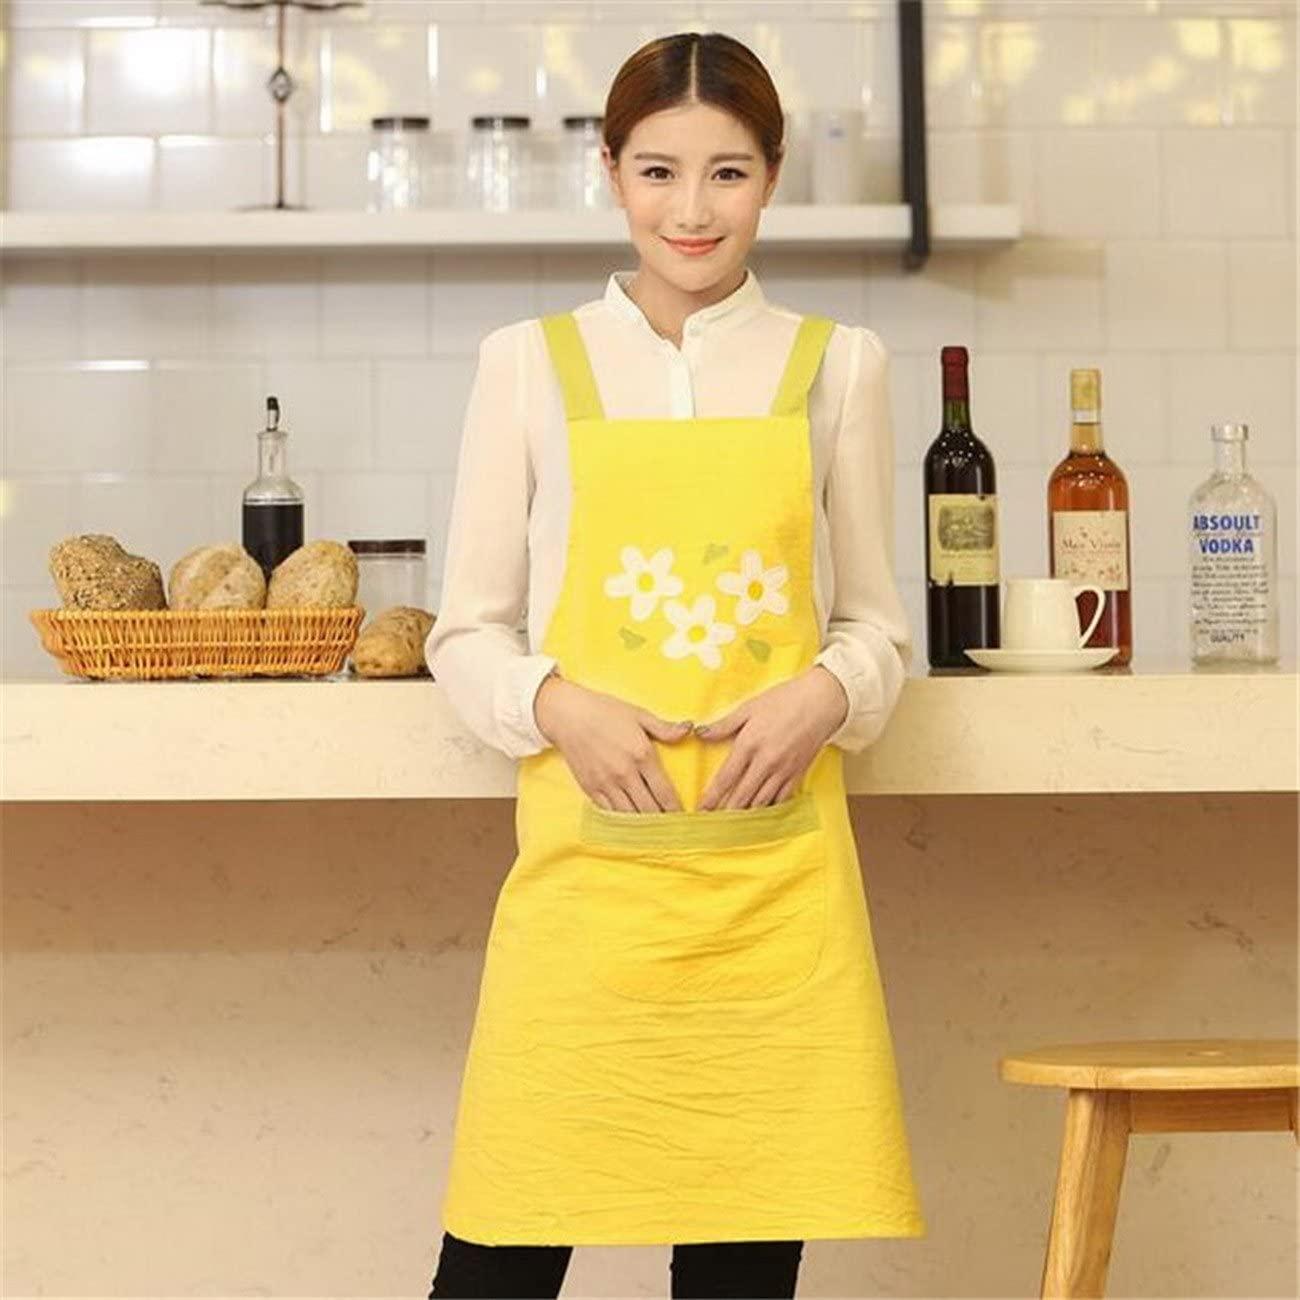 geranjie New Sleeveless Apron Kindergarten Nail Tea Coffee Shop Kitchen cooking baking Restaurants Waiter Work Aprons For Woman LOGO